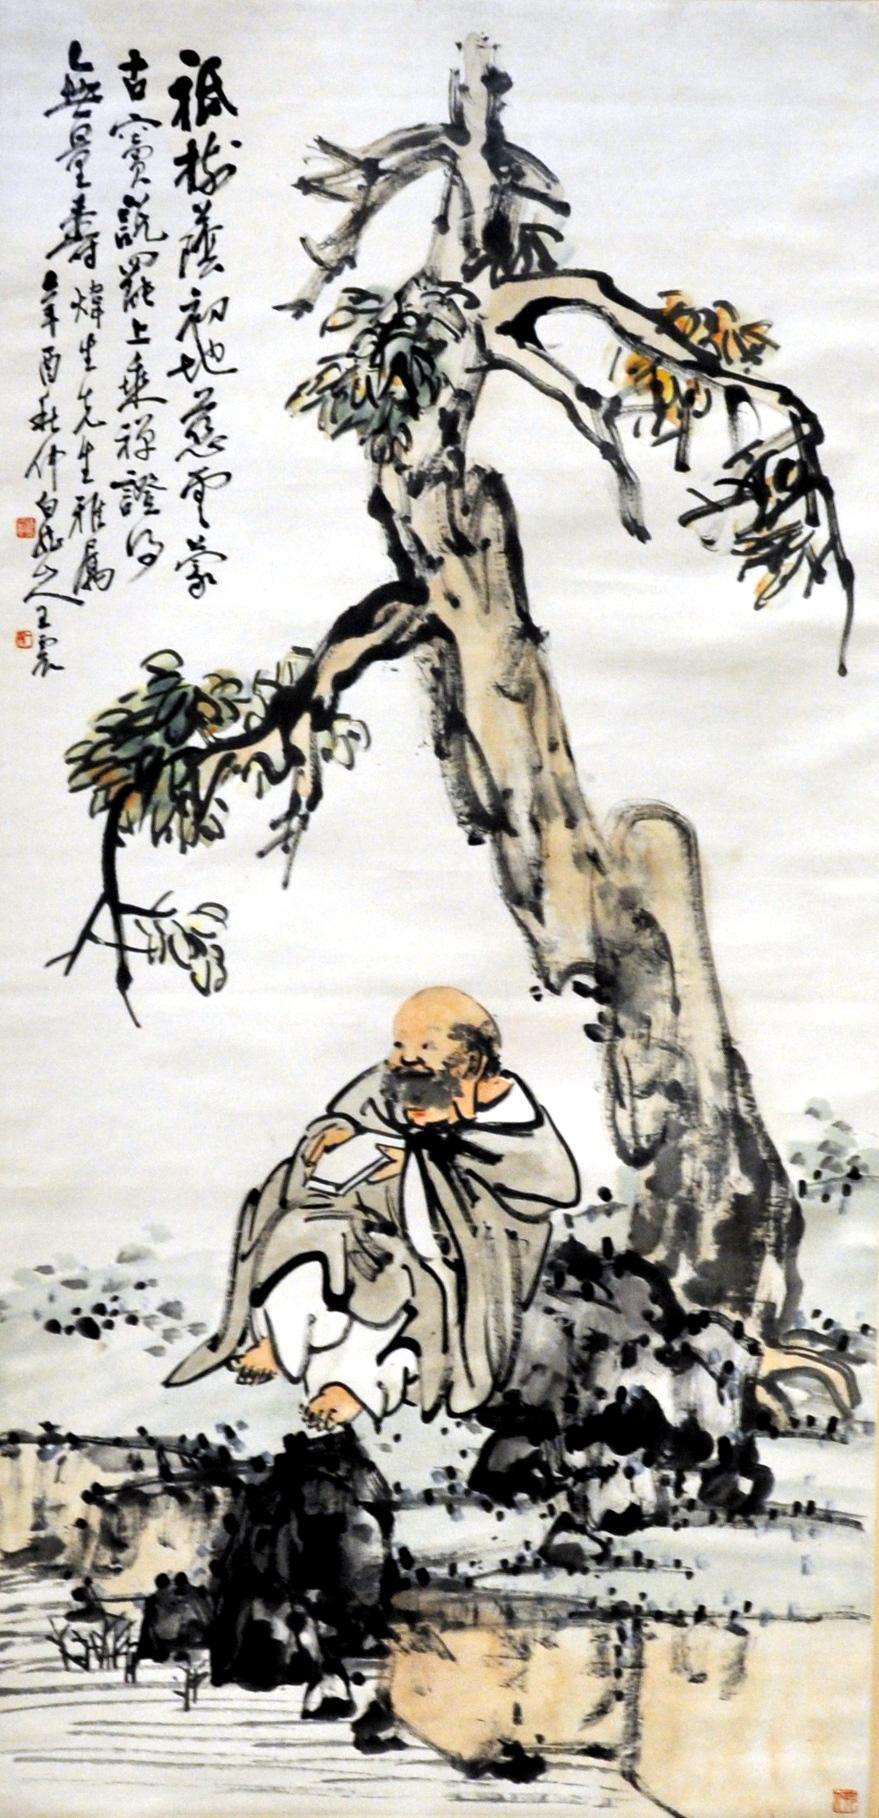 wang zhen budai under a pine tree 1921 rch 1027 img02.jpg